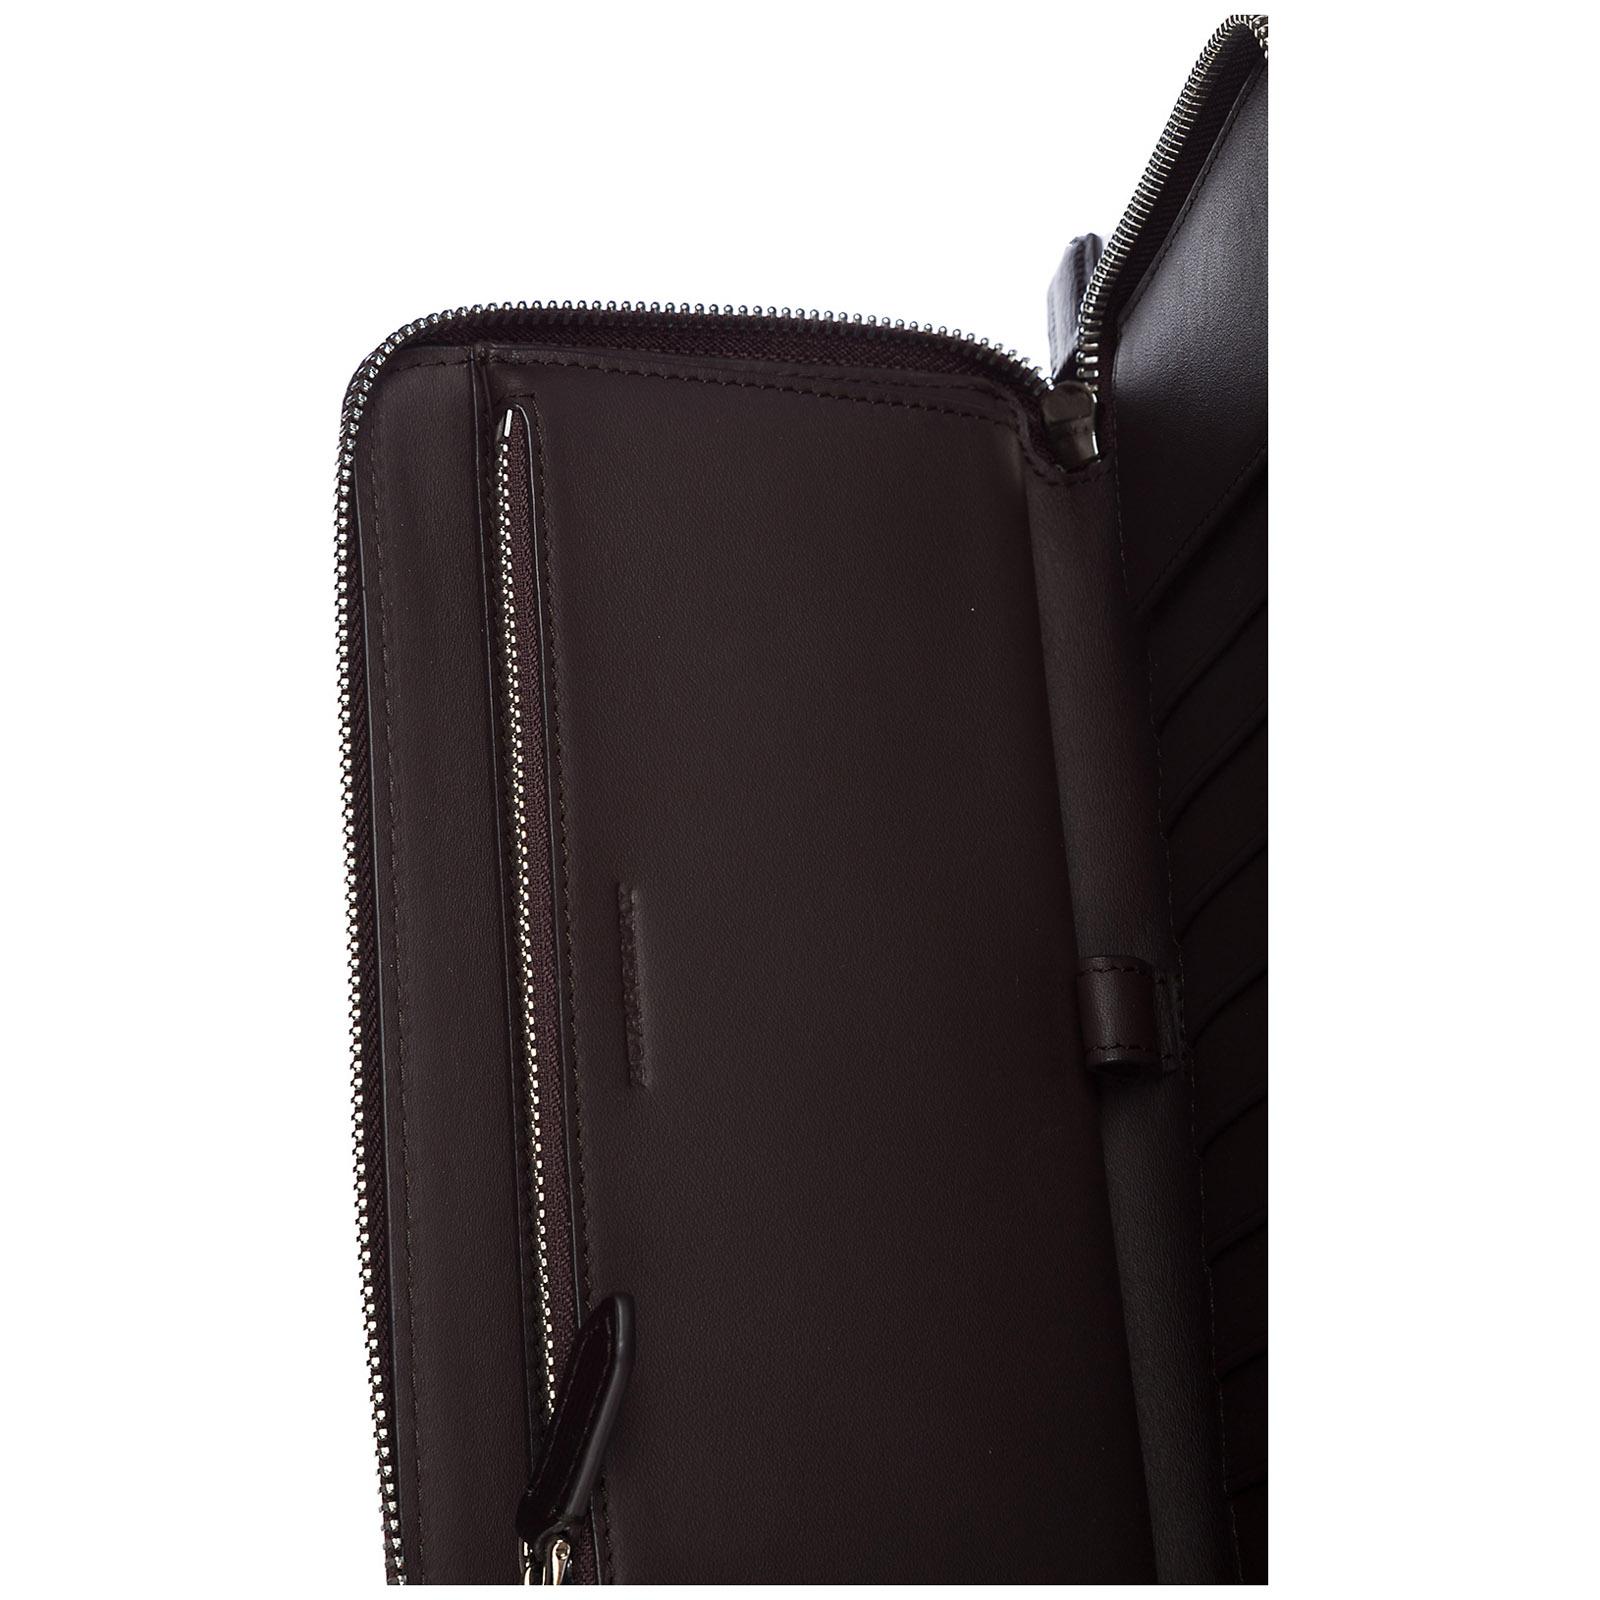 6027fa7ae4d ... Men s wallet coin case holder purse card bifold london check zip around